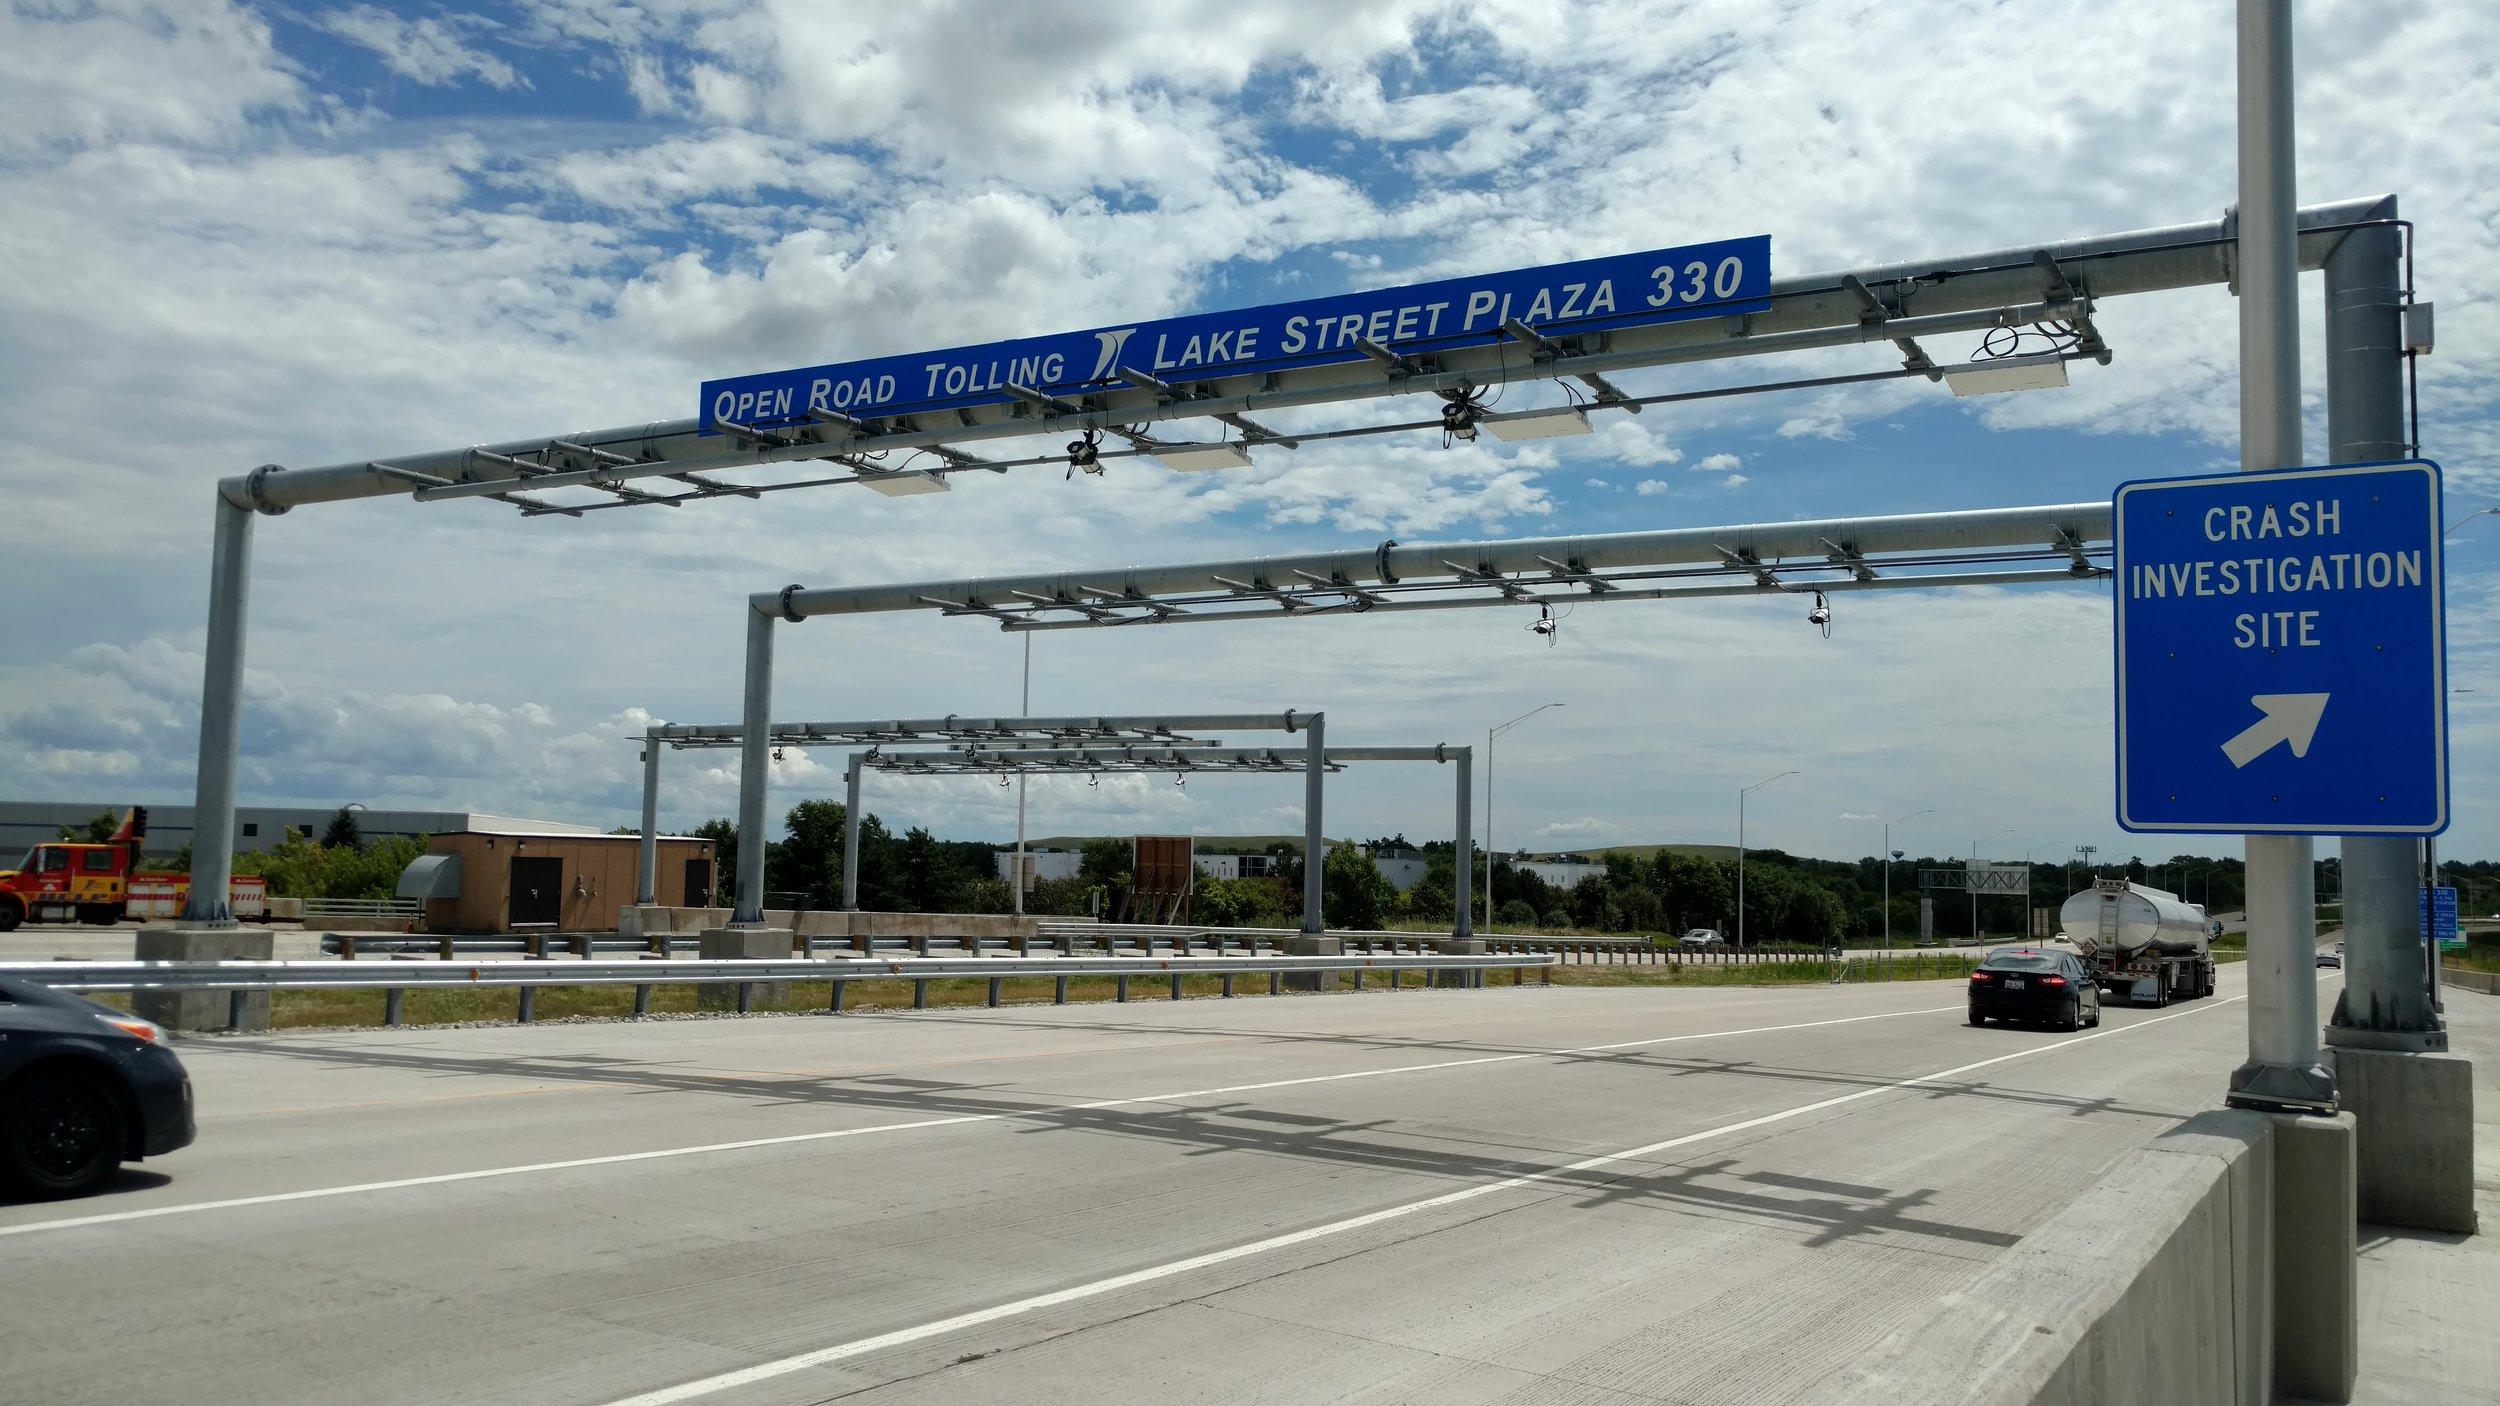 I-390 Tollway/Elgin-O'Hare Corridor